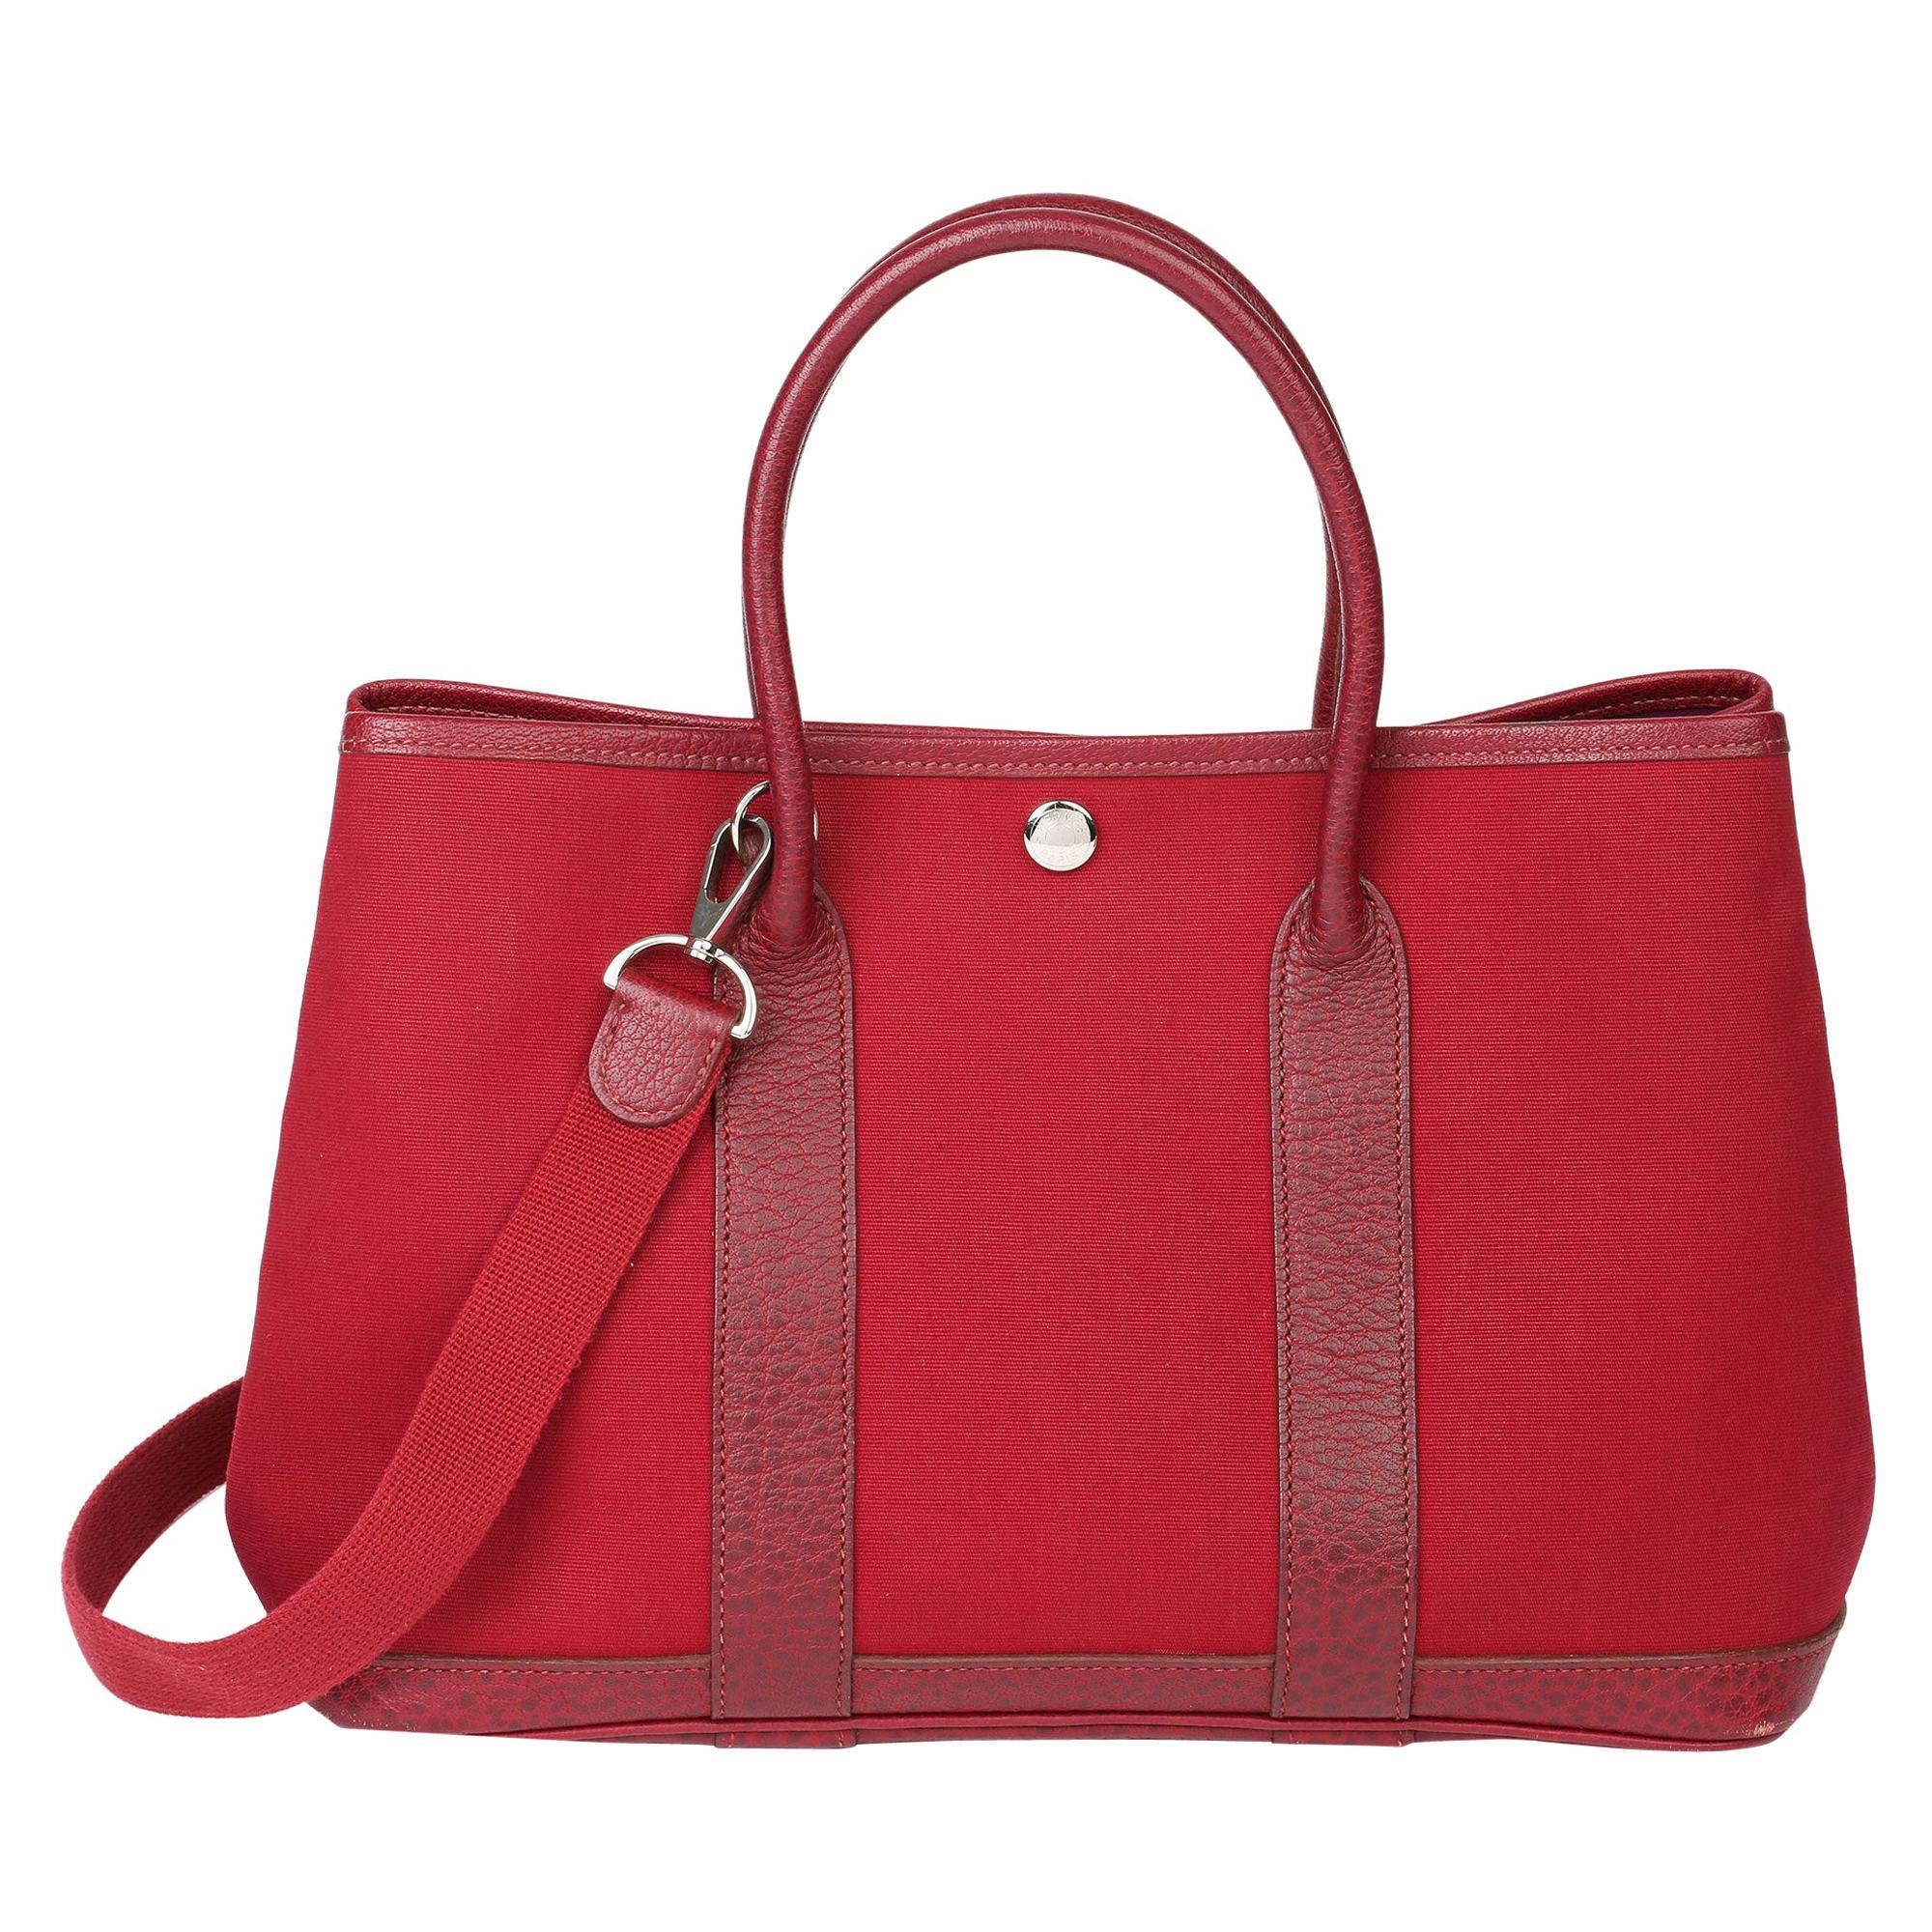 Hermès Rouge imperial Negonda Leather & Tosca Canvas Garden Party TPM